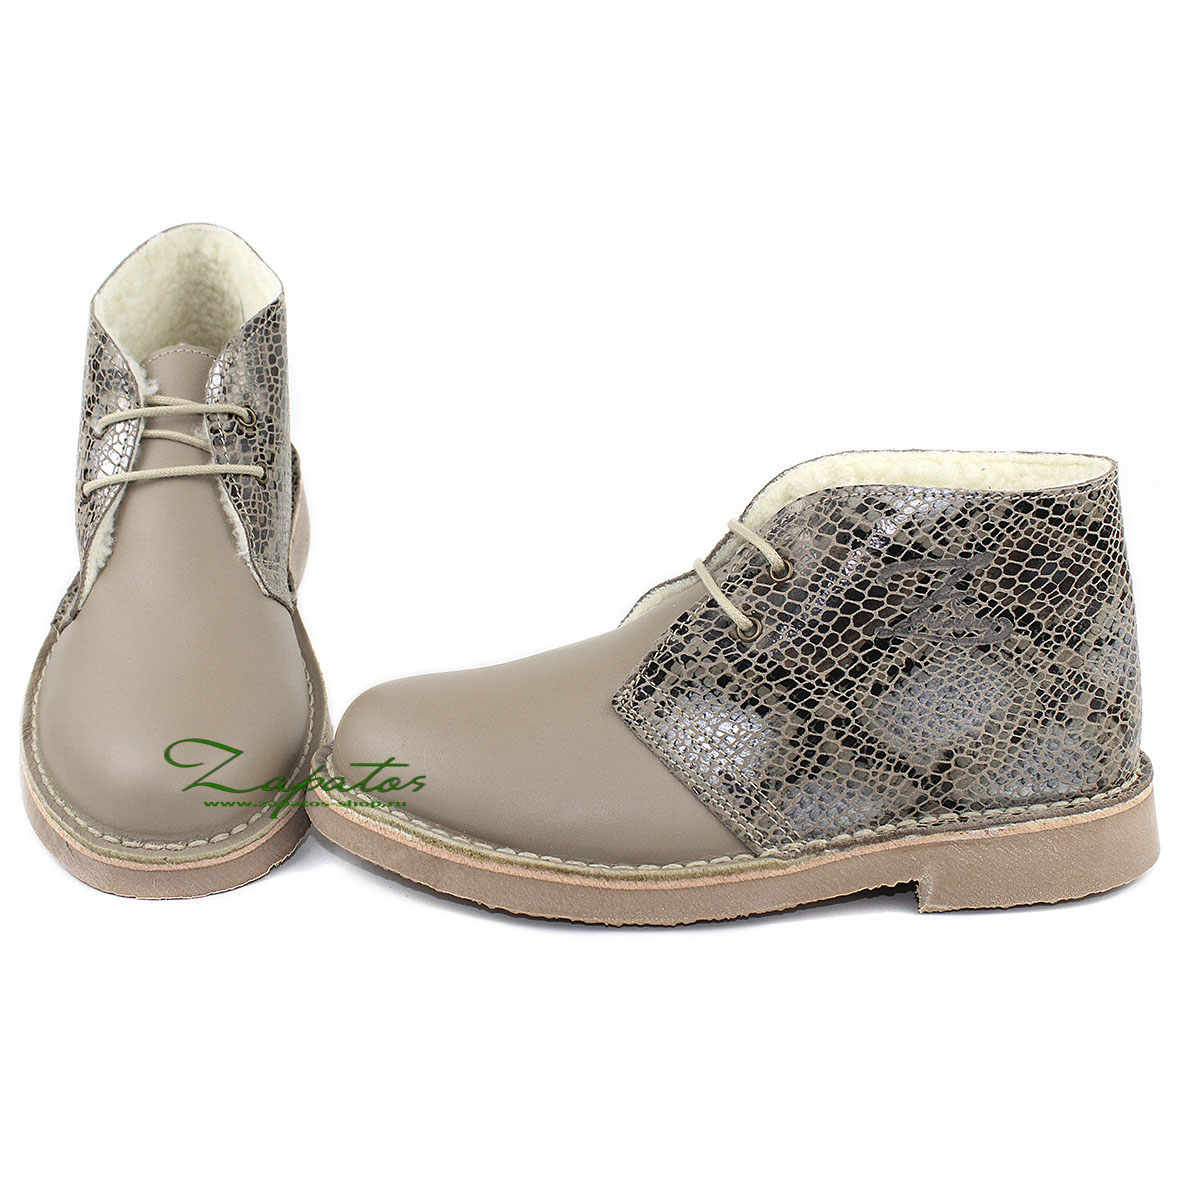 AB.Zapatos 4525 BEIG